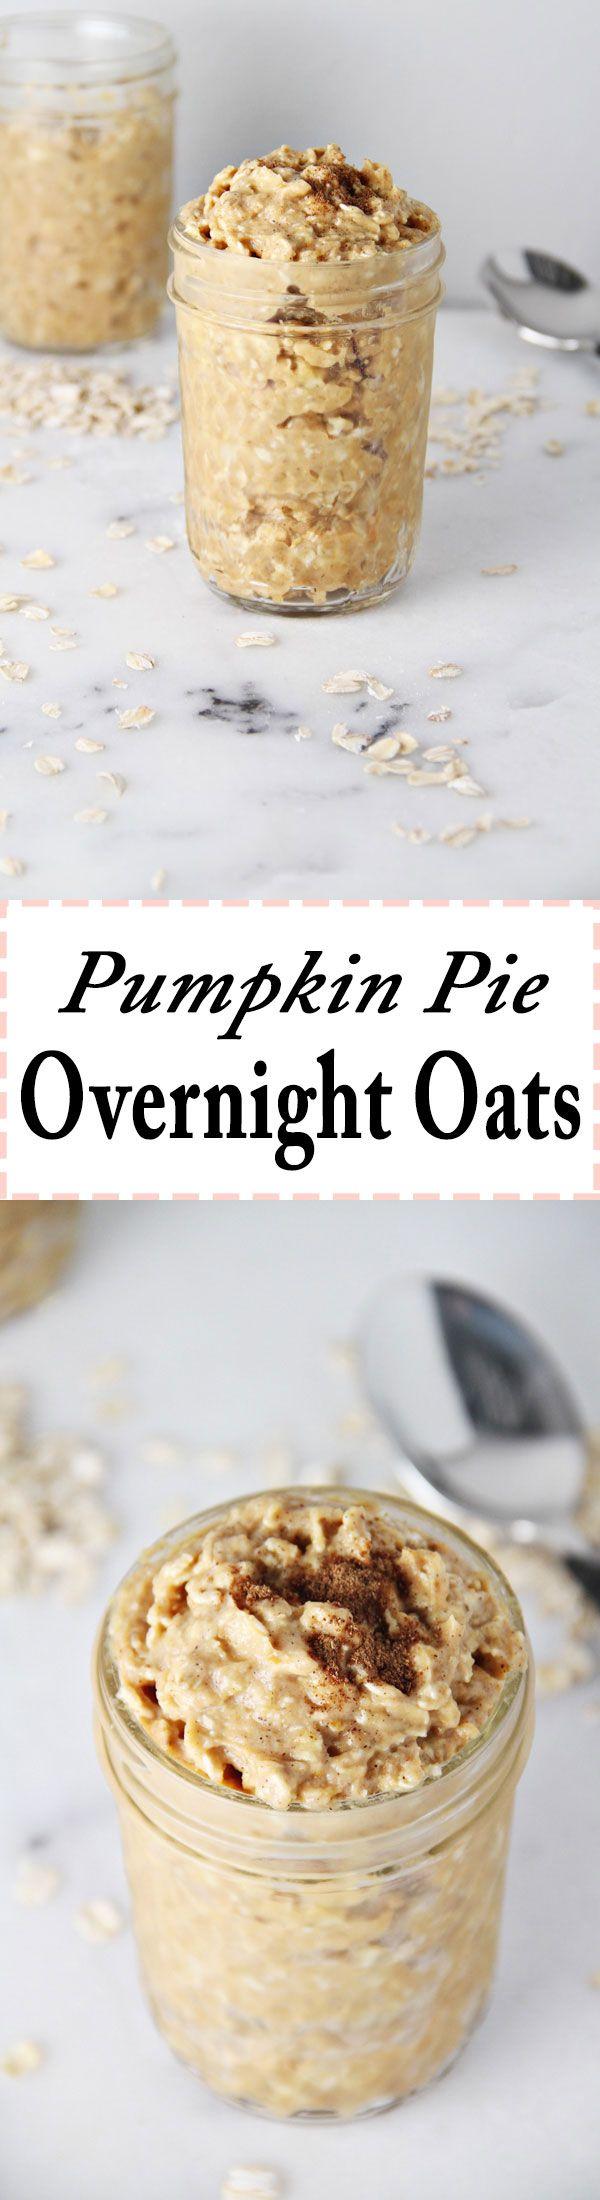 Pumpkin Pie Overnight Oats by JarOfLemons.com! SO good!